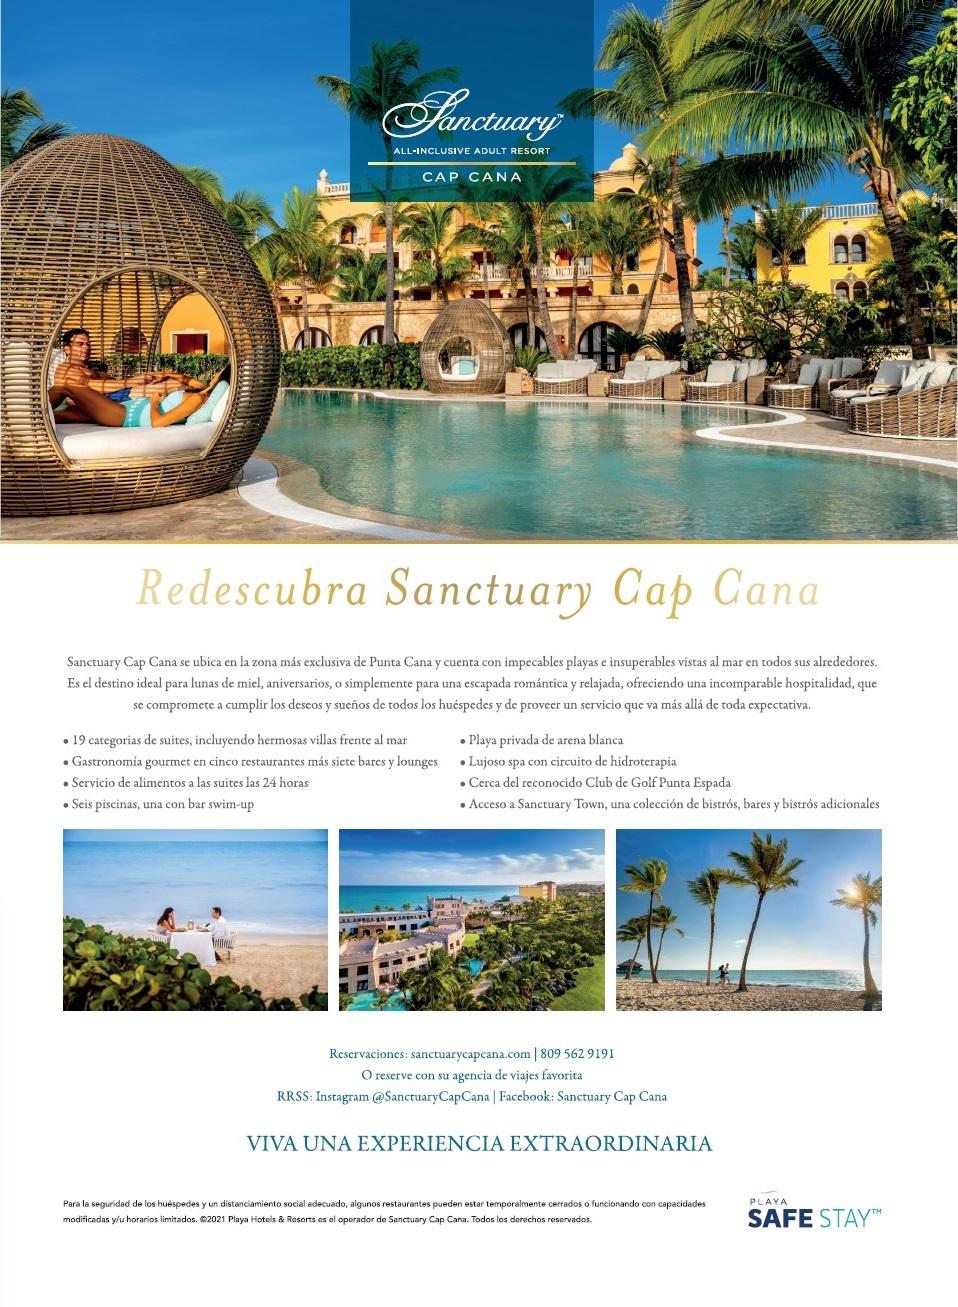 Sanctuary Cap Cana by Playa - Hotels & Resorts en